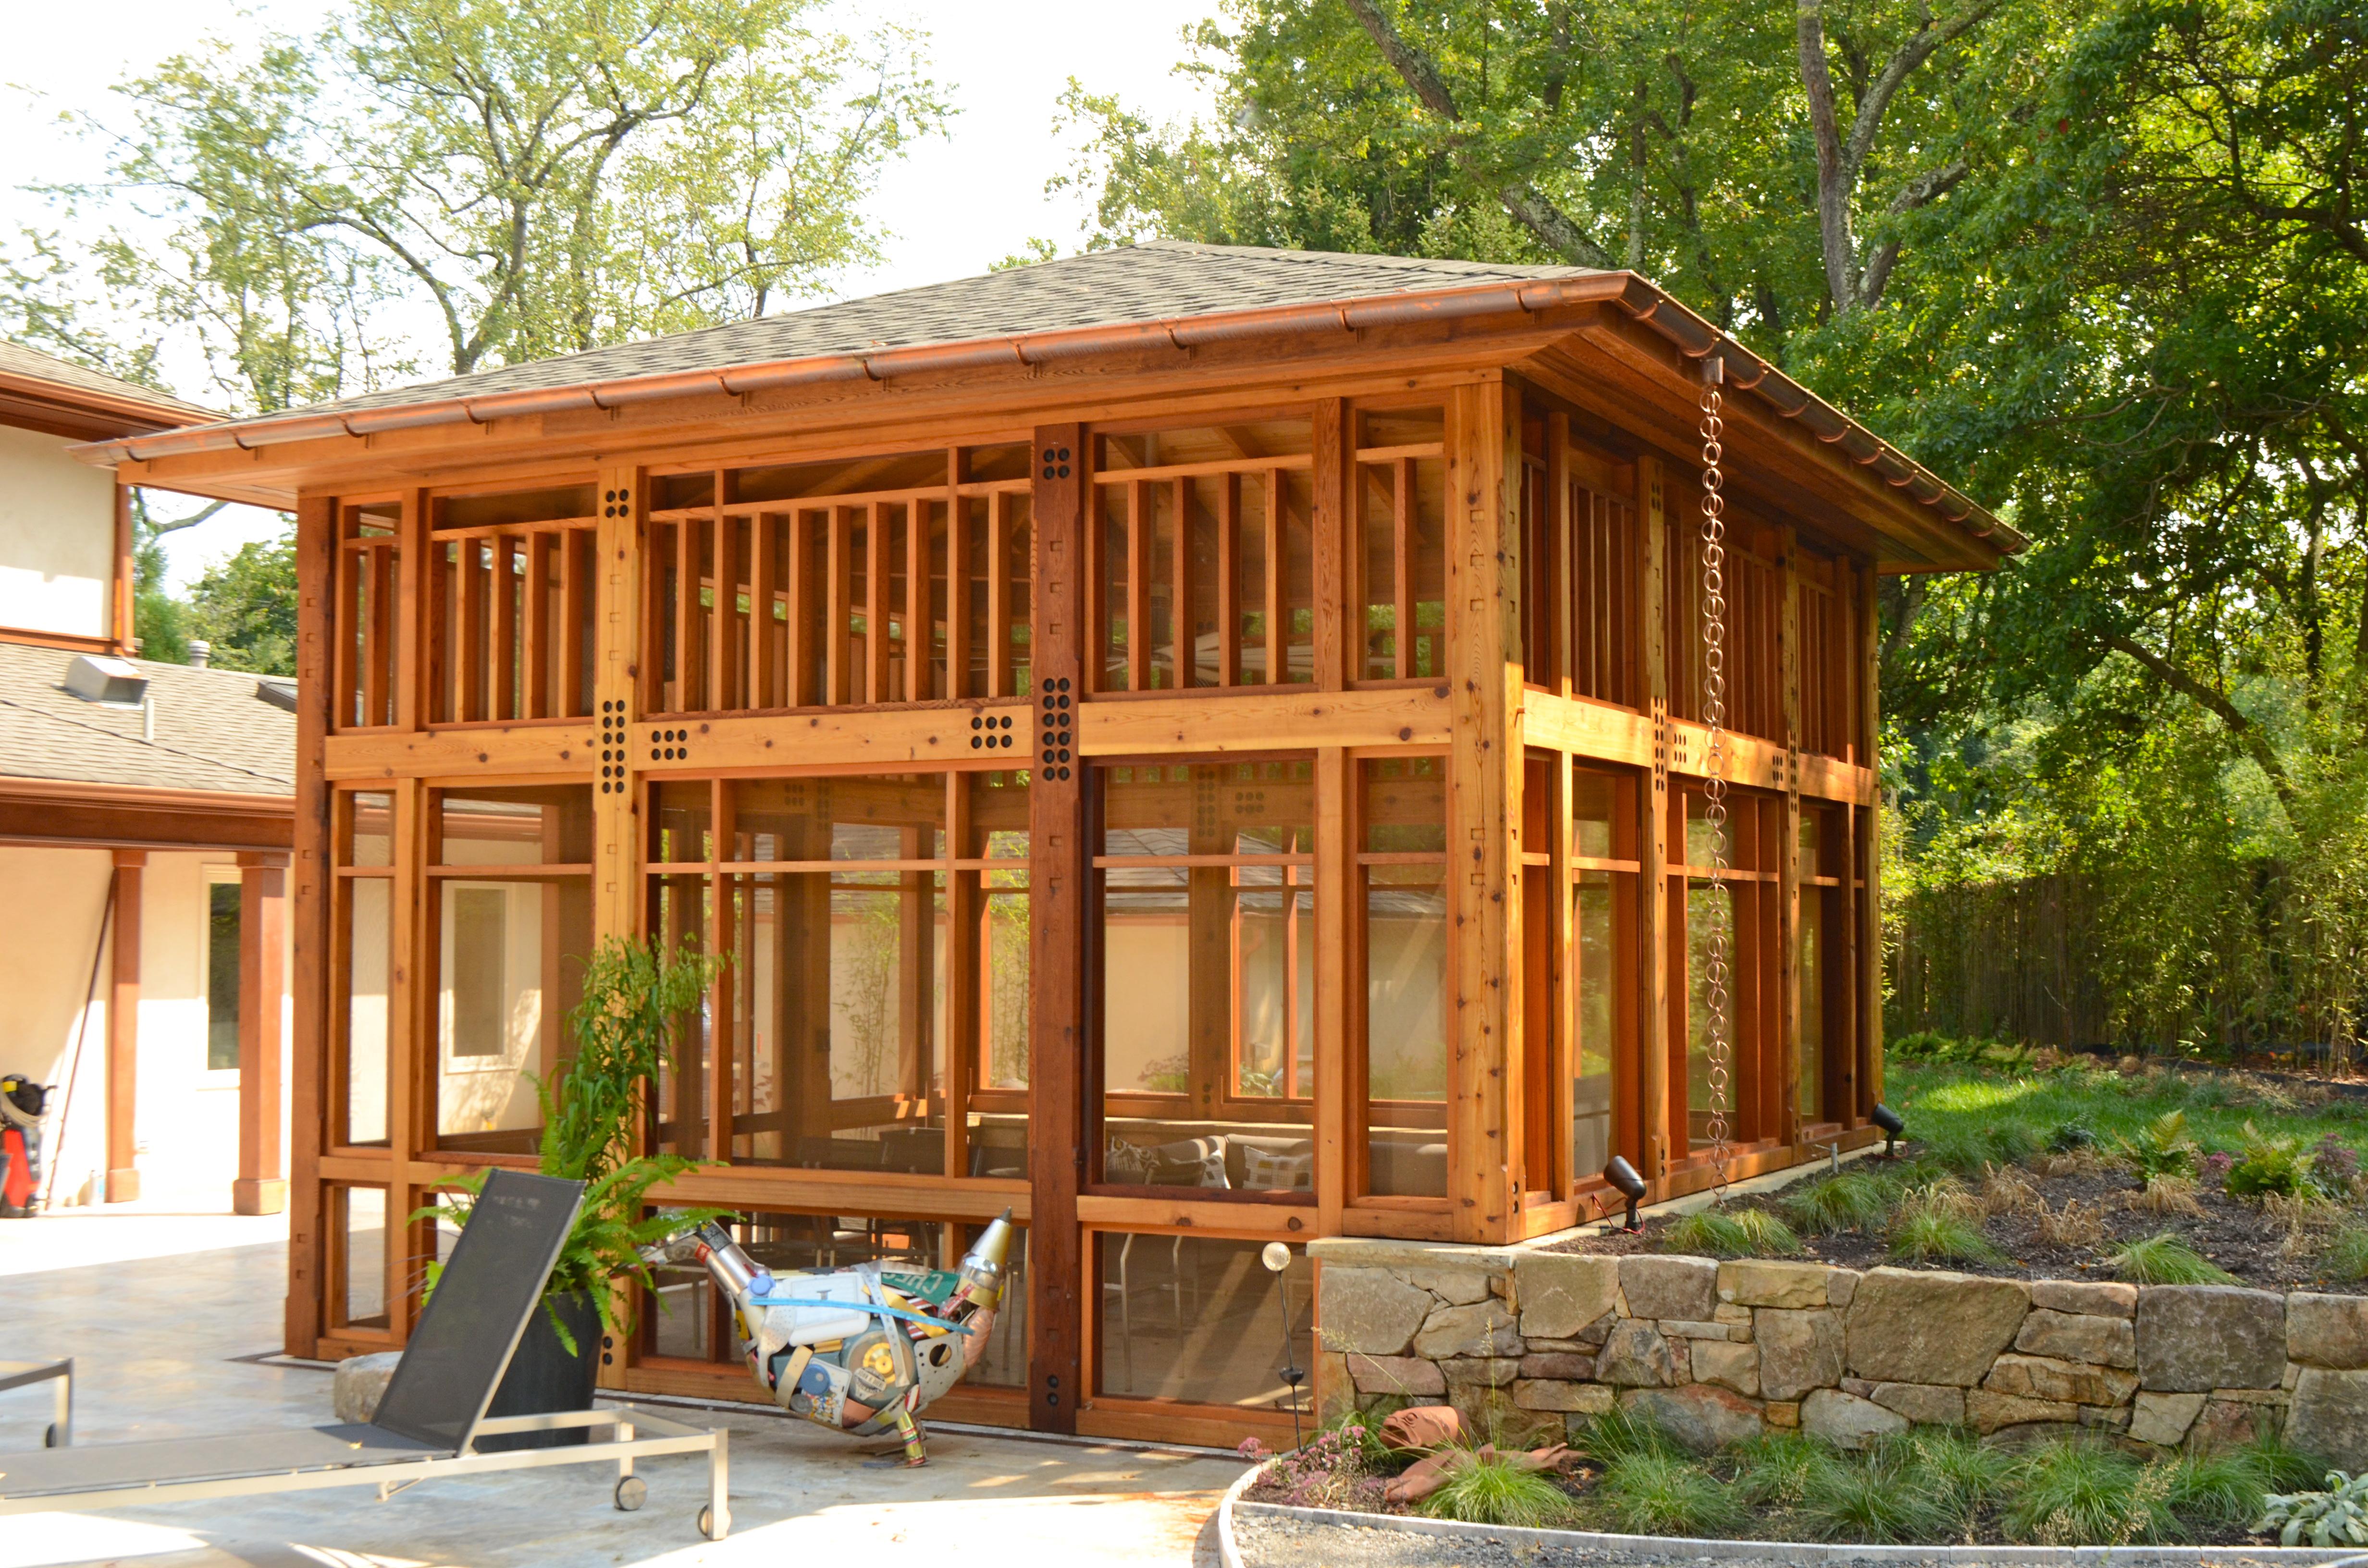 Timber Framed Screened In Porch - Hugh Lofting Timber Framing Inc